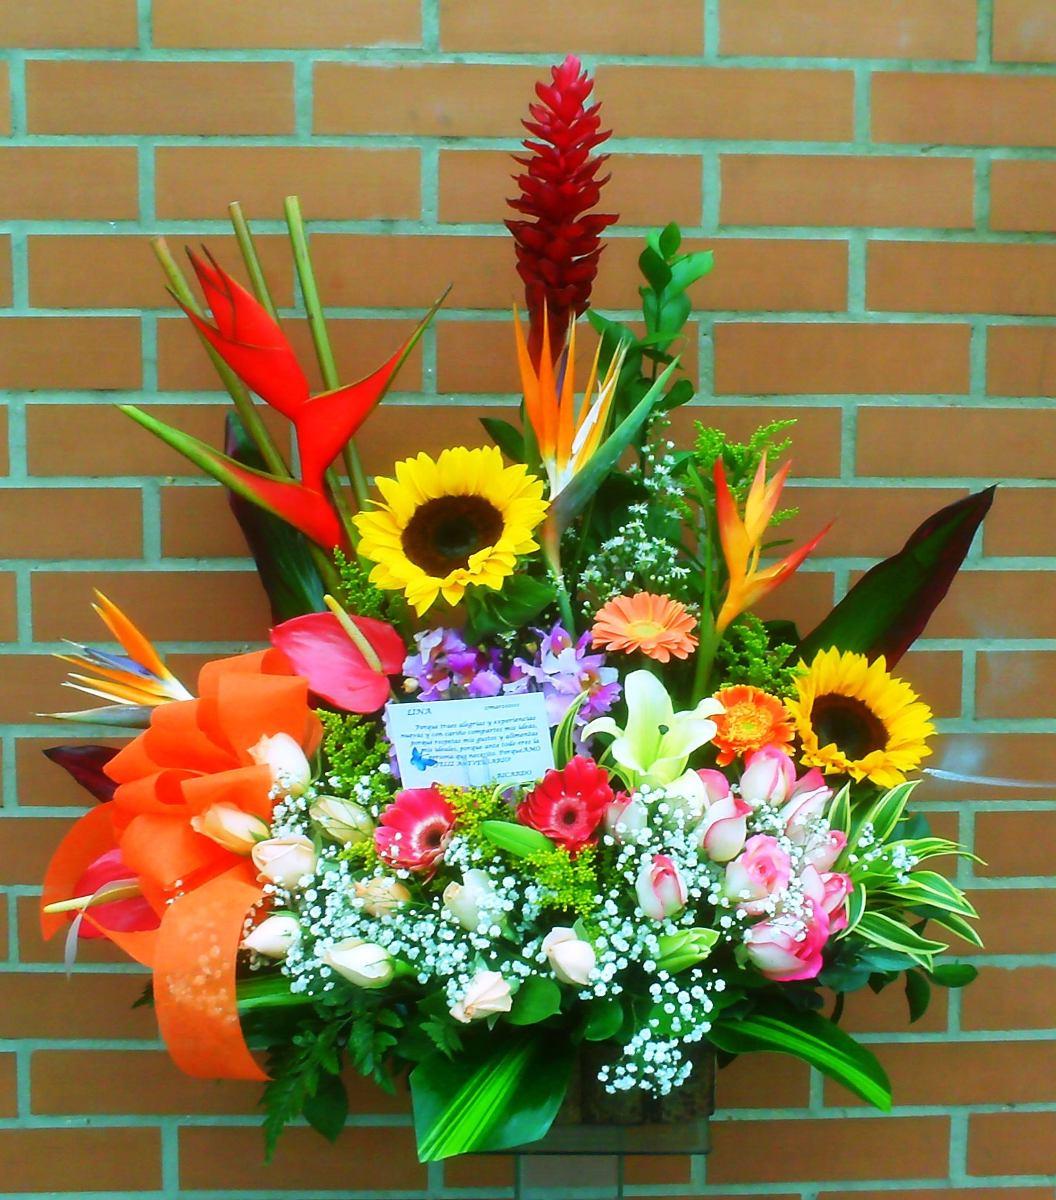 Arreglos Flores - Rosas- Detalle Dia De La Madre - $ 109 ...  Arreglos Flores...